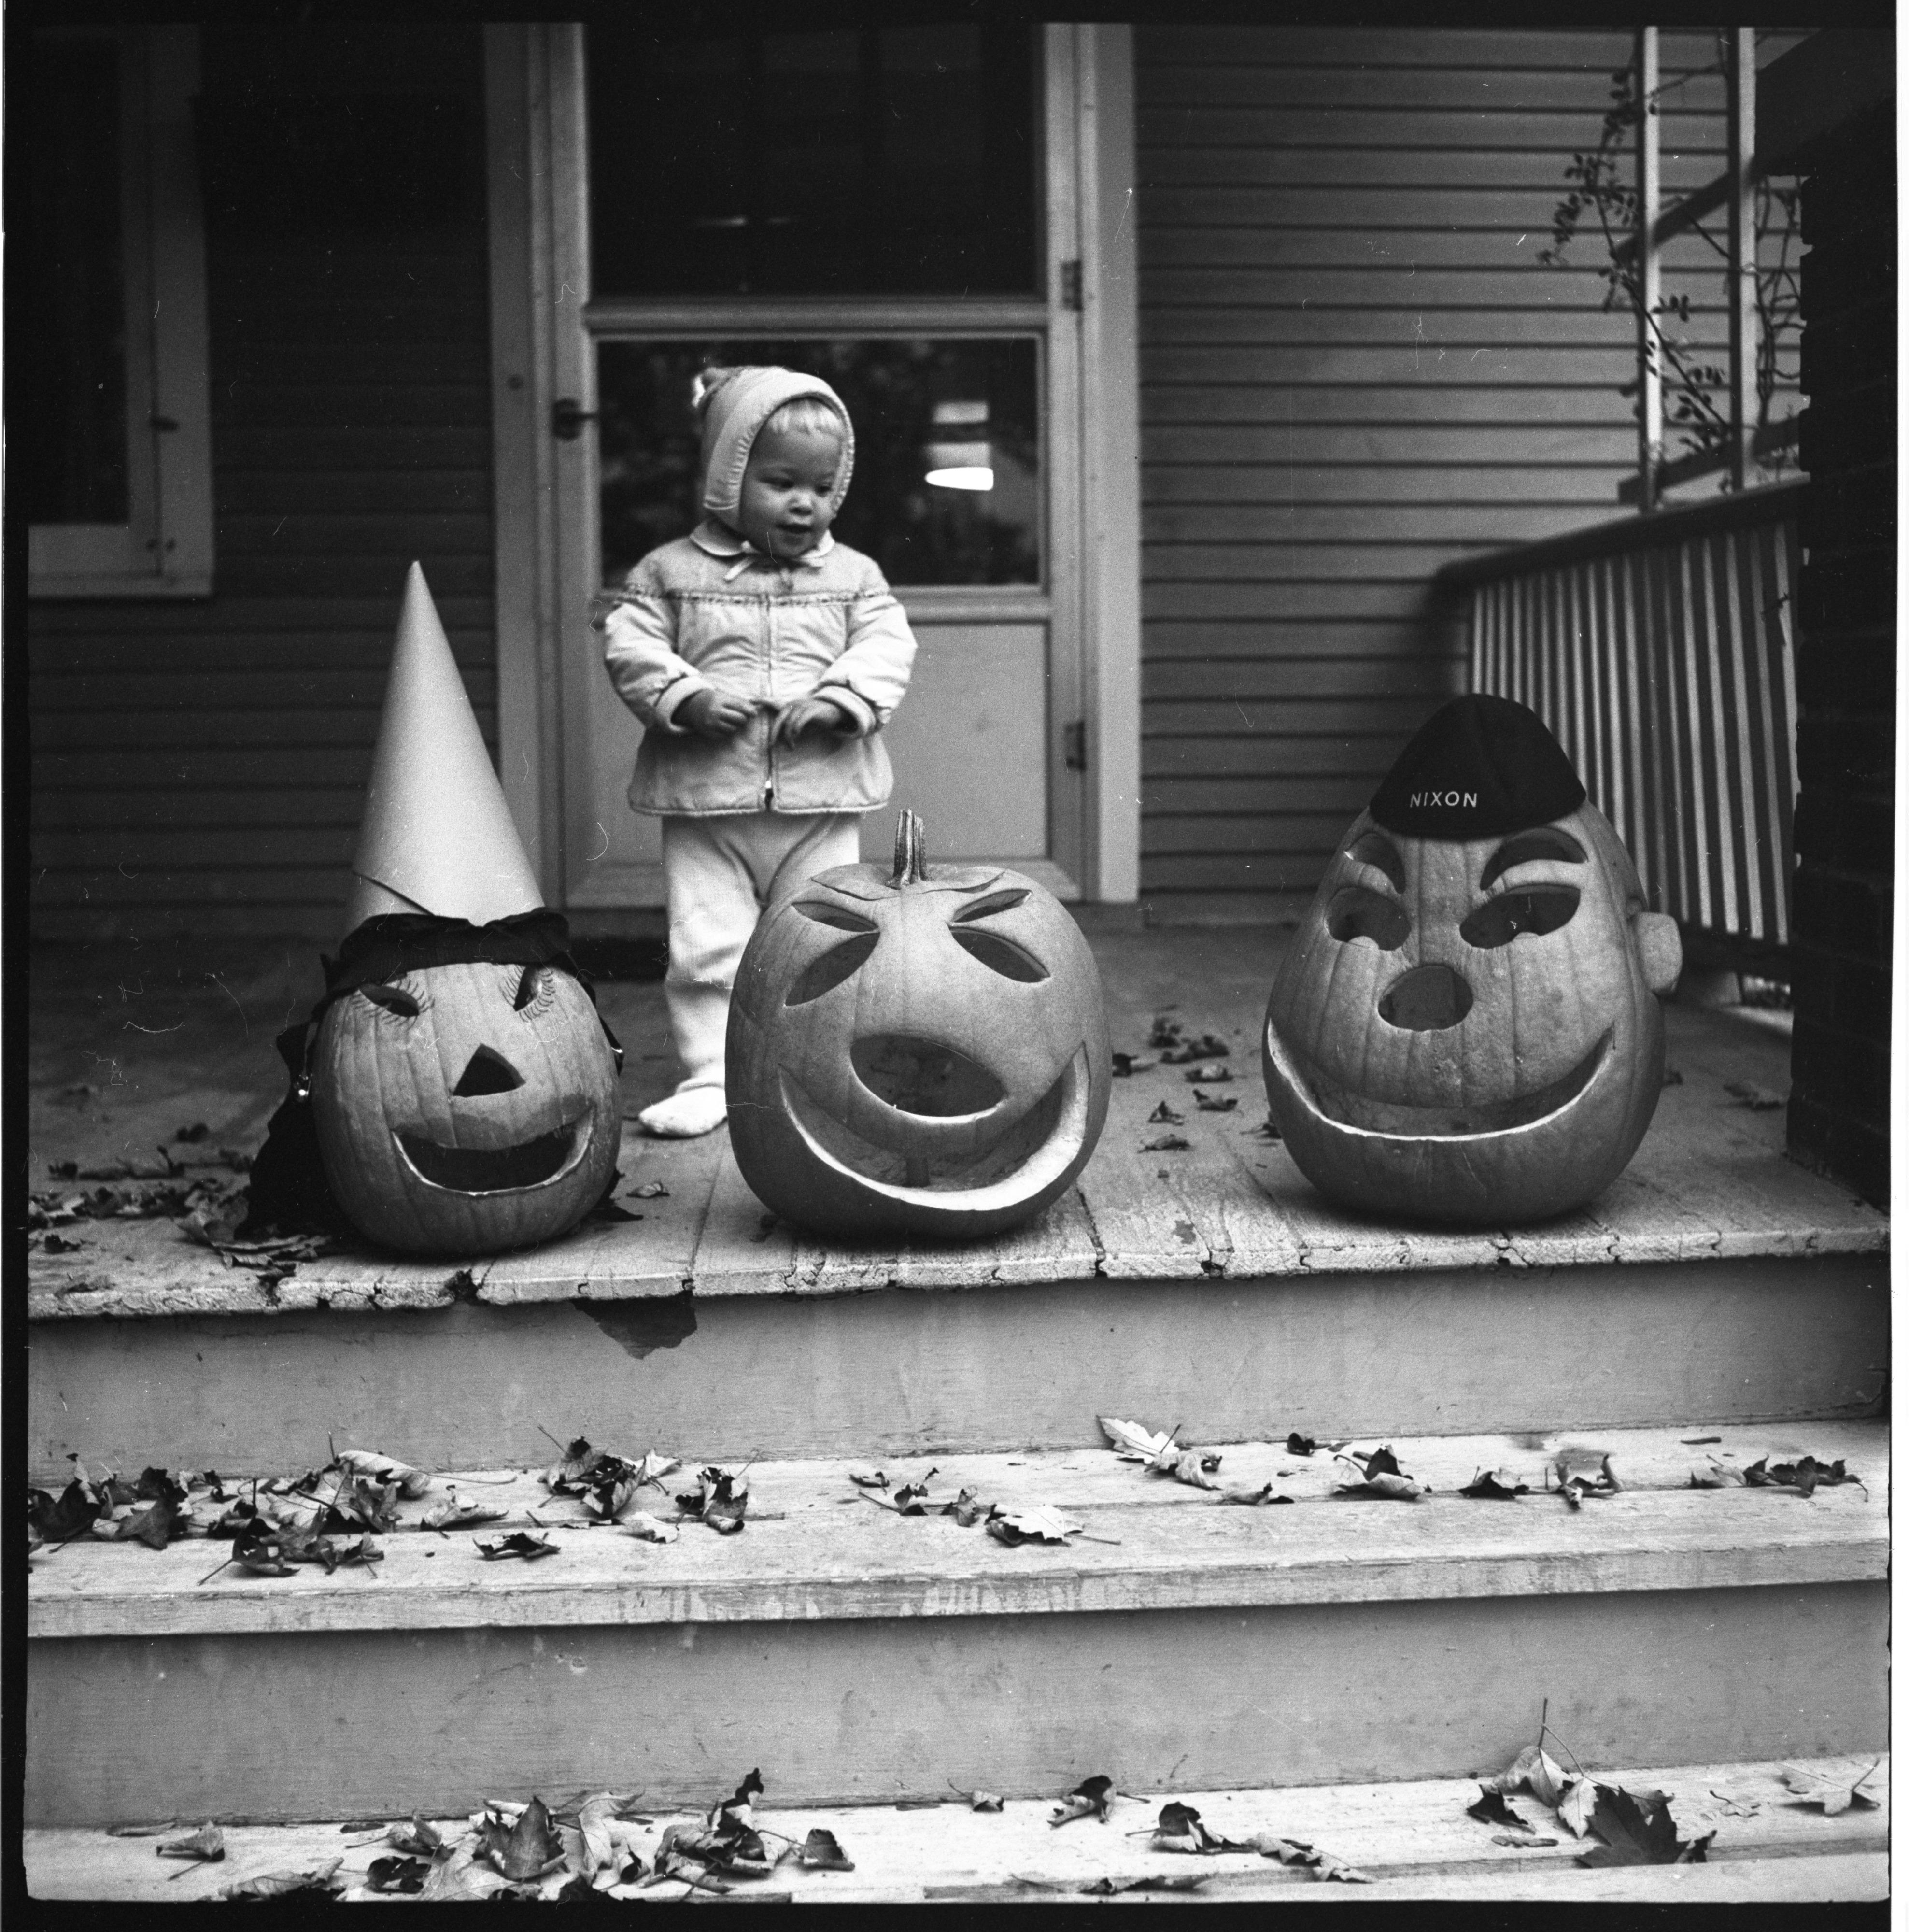 Jackie Green With Jack-O-Lanterns, October 1960 image